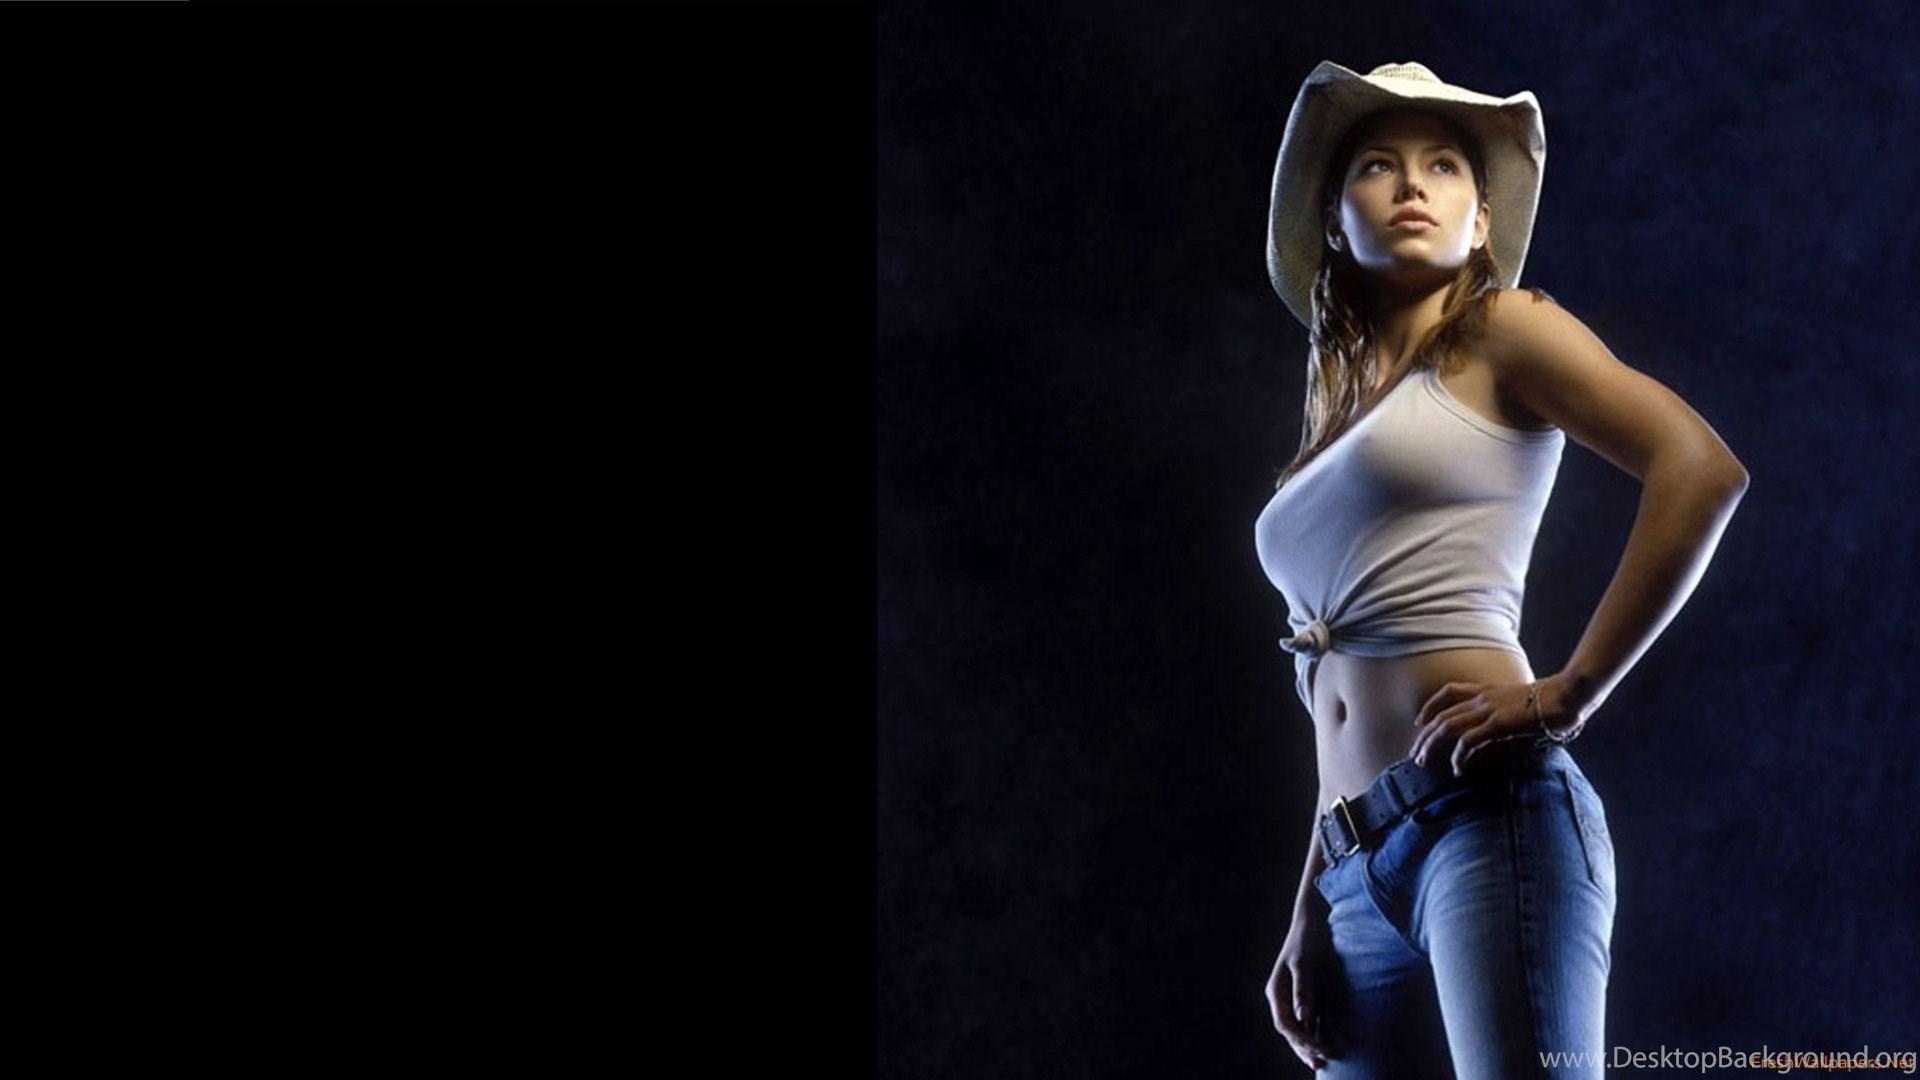 Hot Jessica Biel nudes (95 photo), Sexy, Sideboobs, Selfie, lingerie 2006